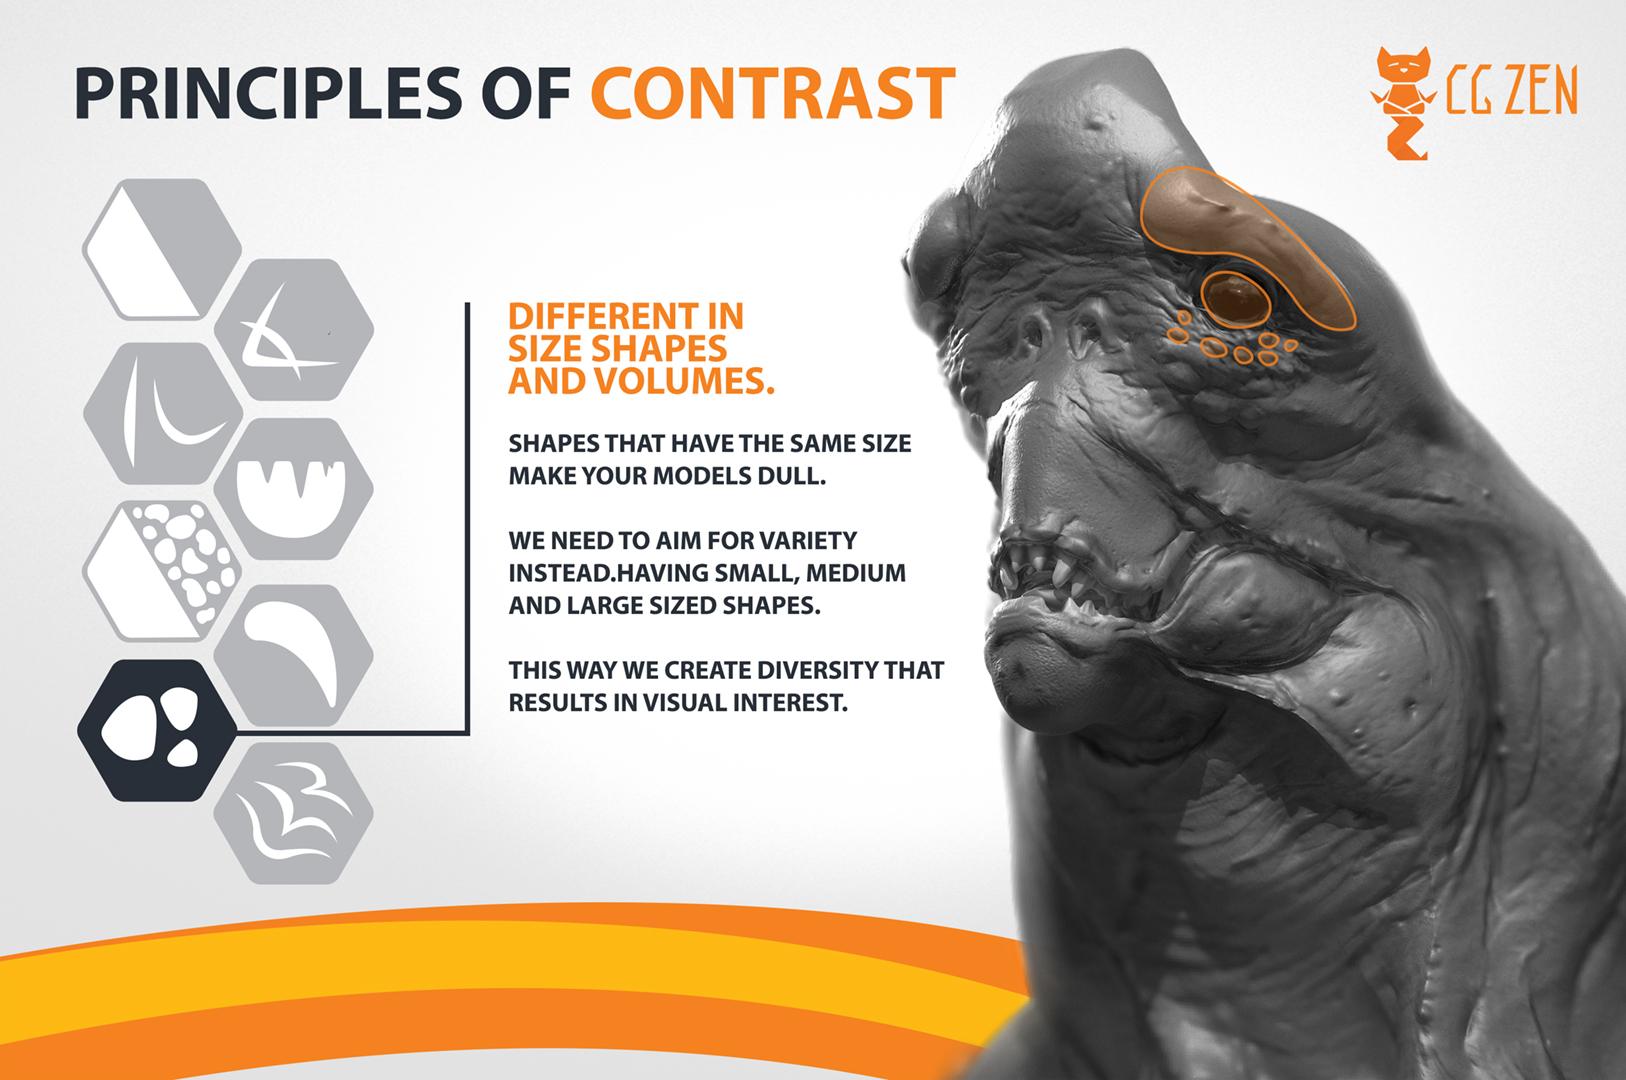 02-contrast-design-primary-secondary-thertiary-cgzen-EN